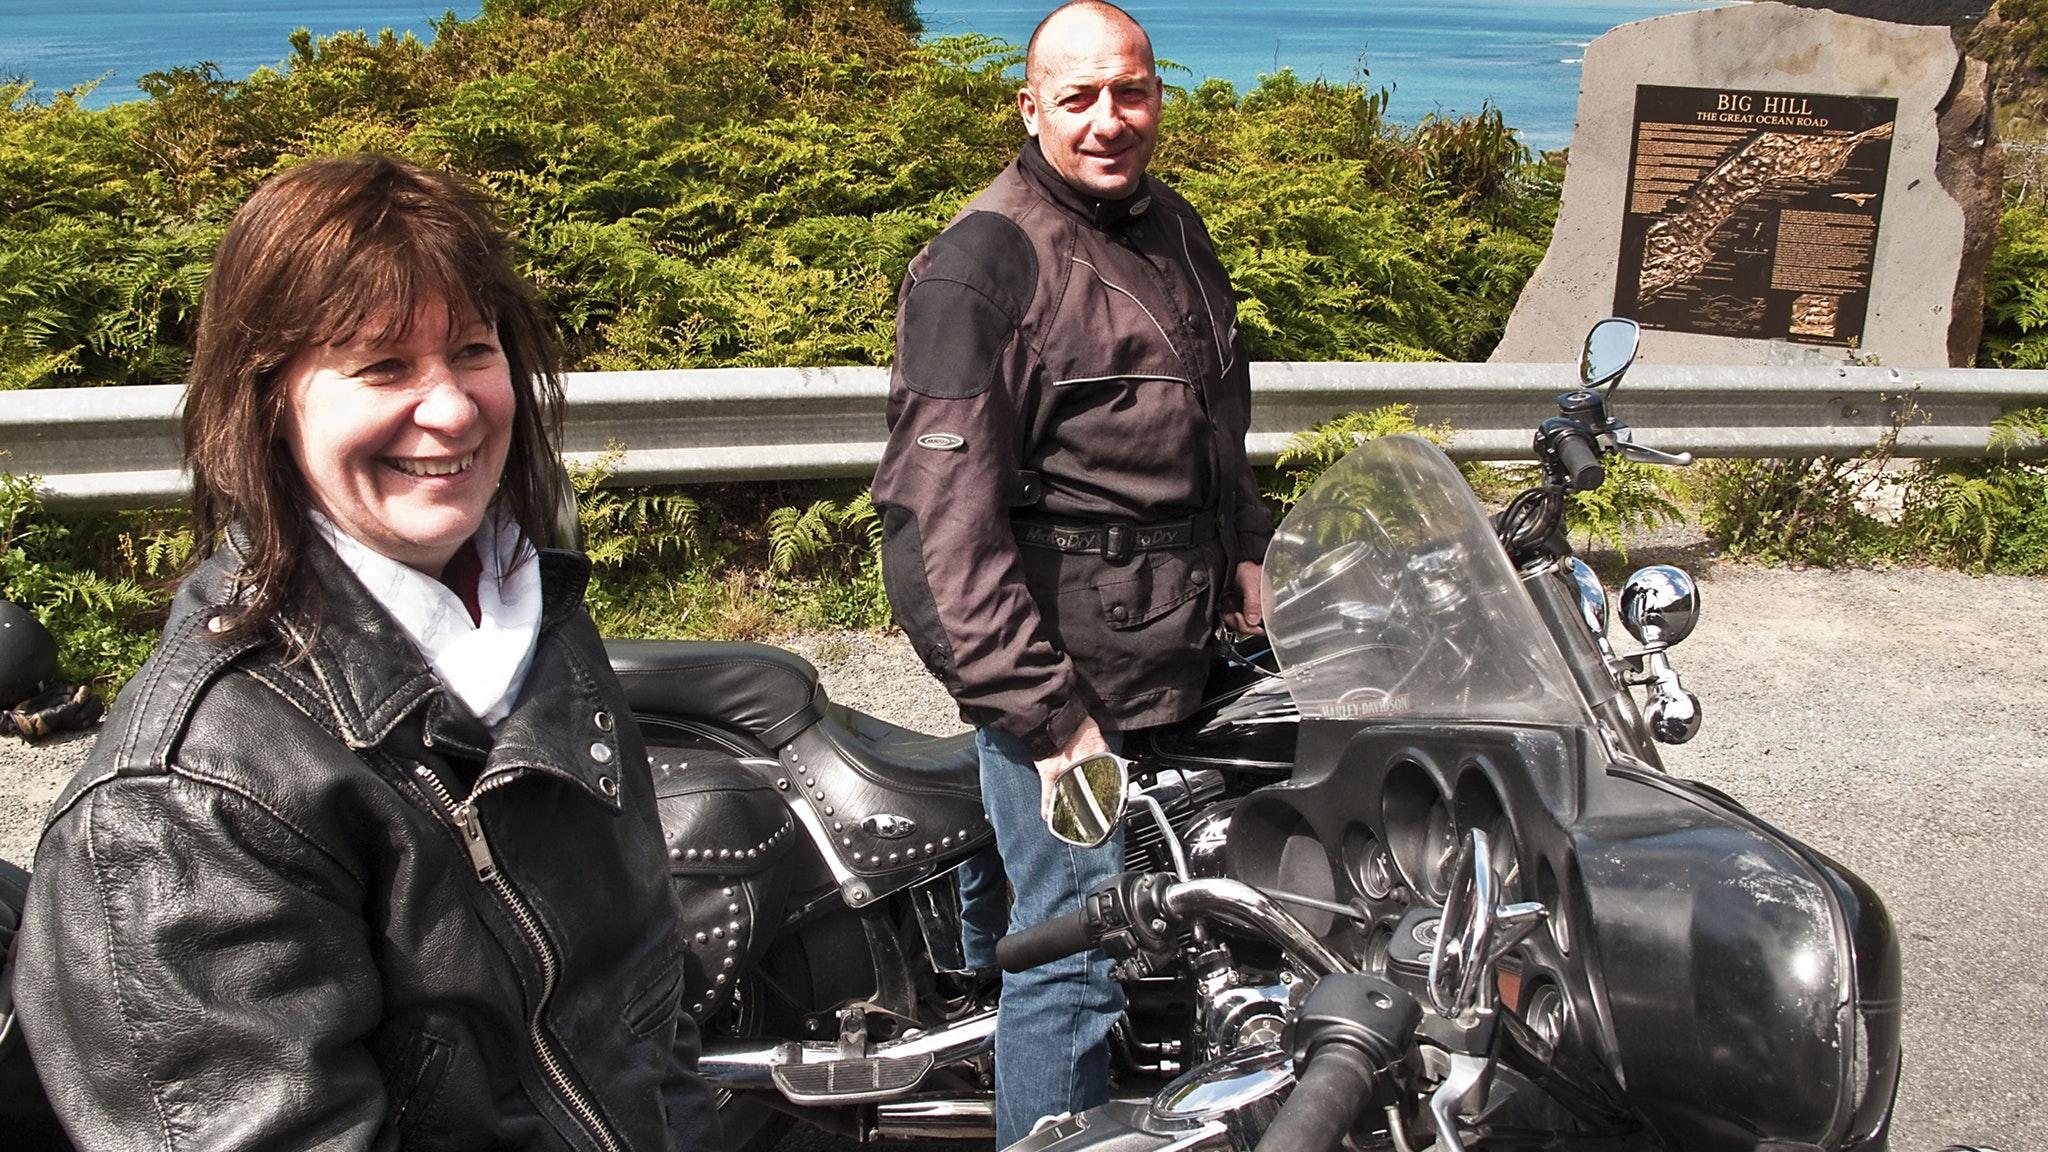 Photograpy break Apollo Bay Harley Ride